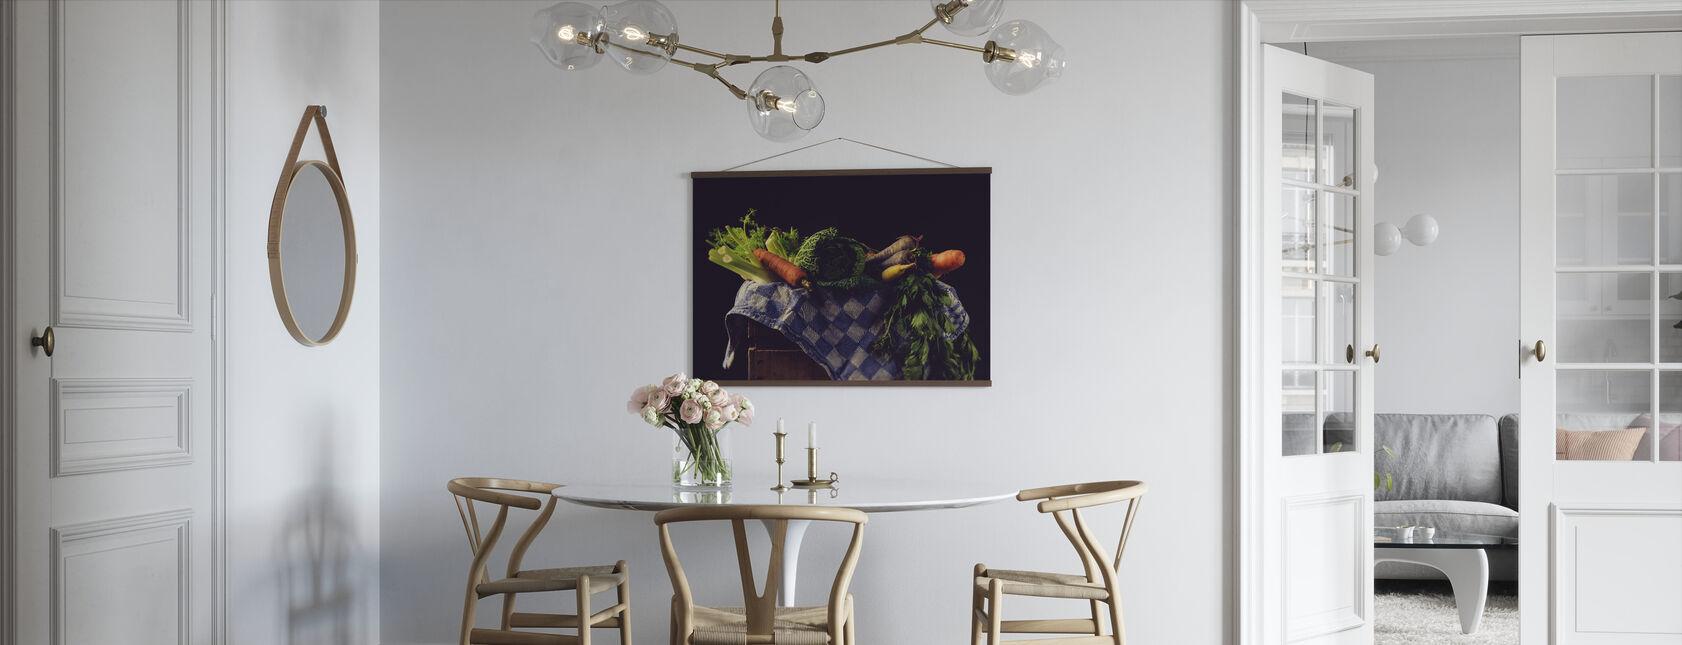 Grönsaker - Poster - Kök